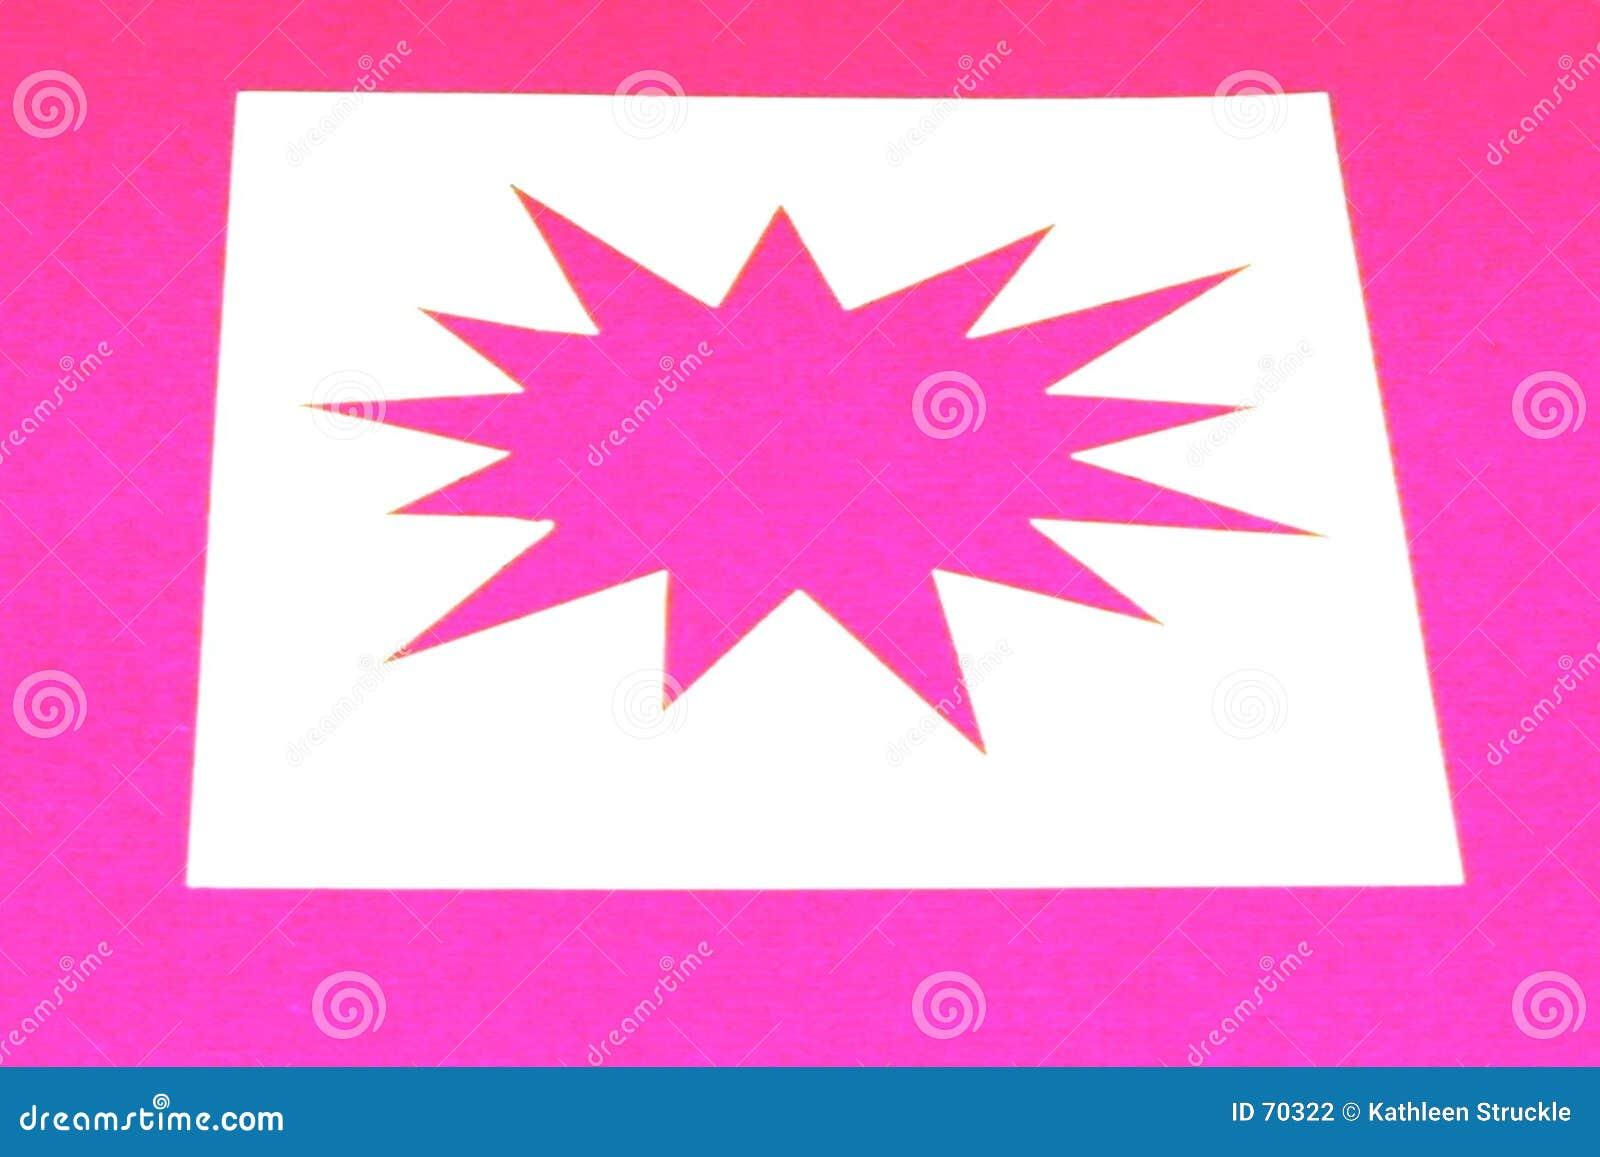 Pink star burst